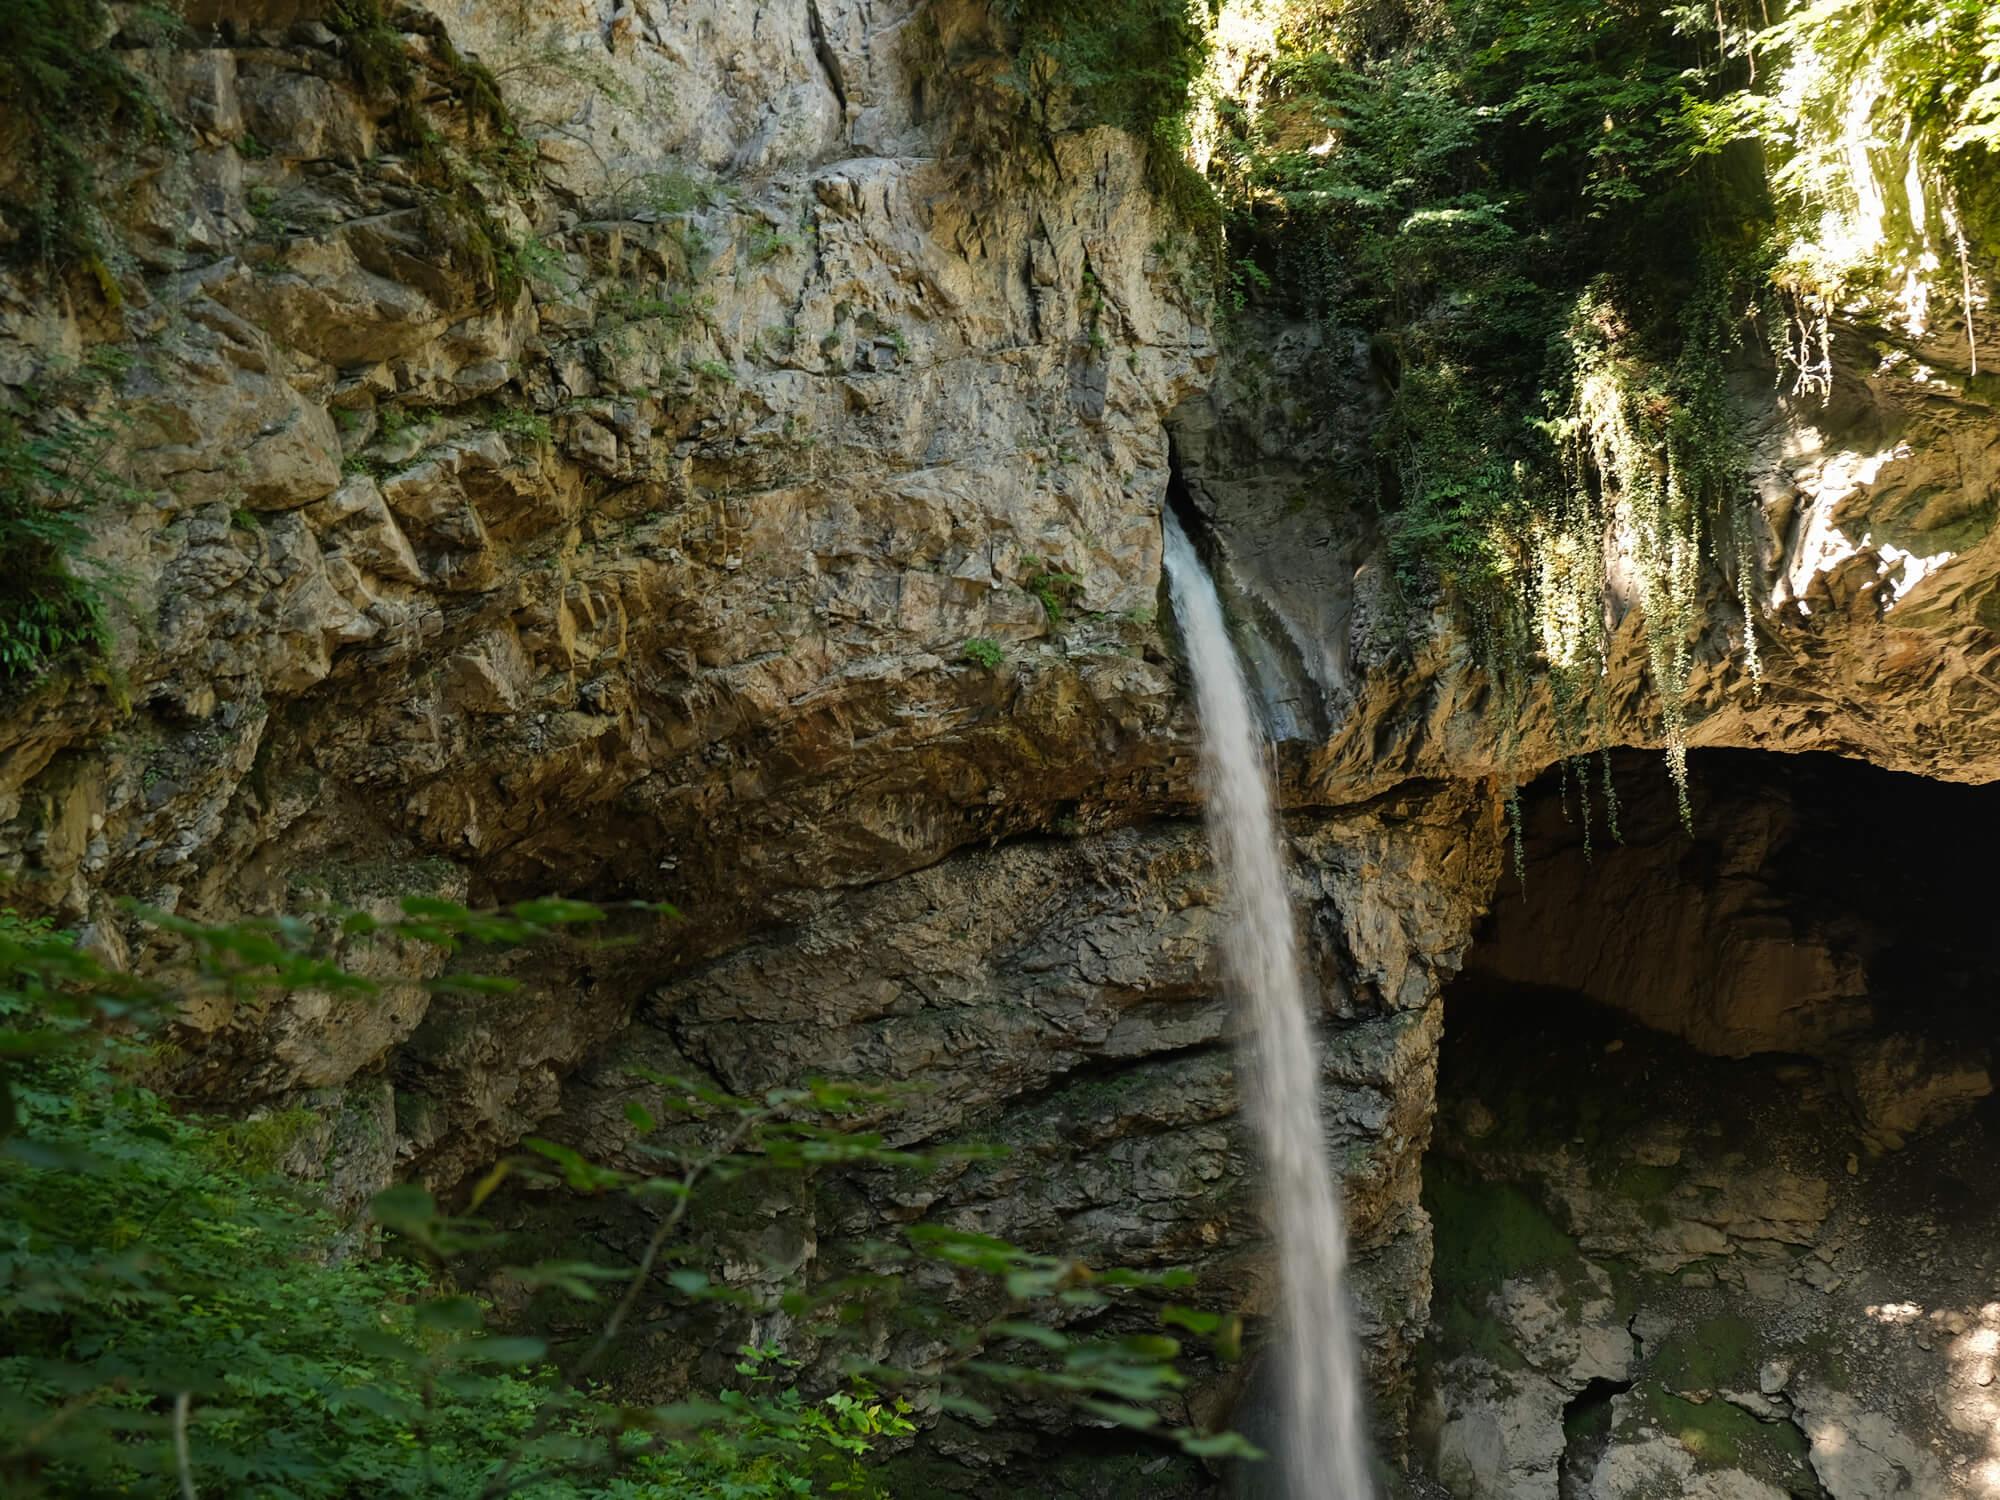 Cascades proches du lac d'Annecy -  cascade de Seythenex